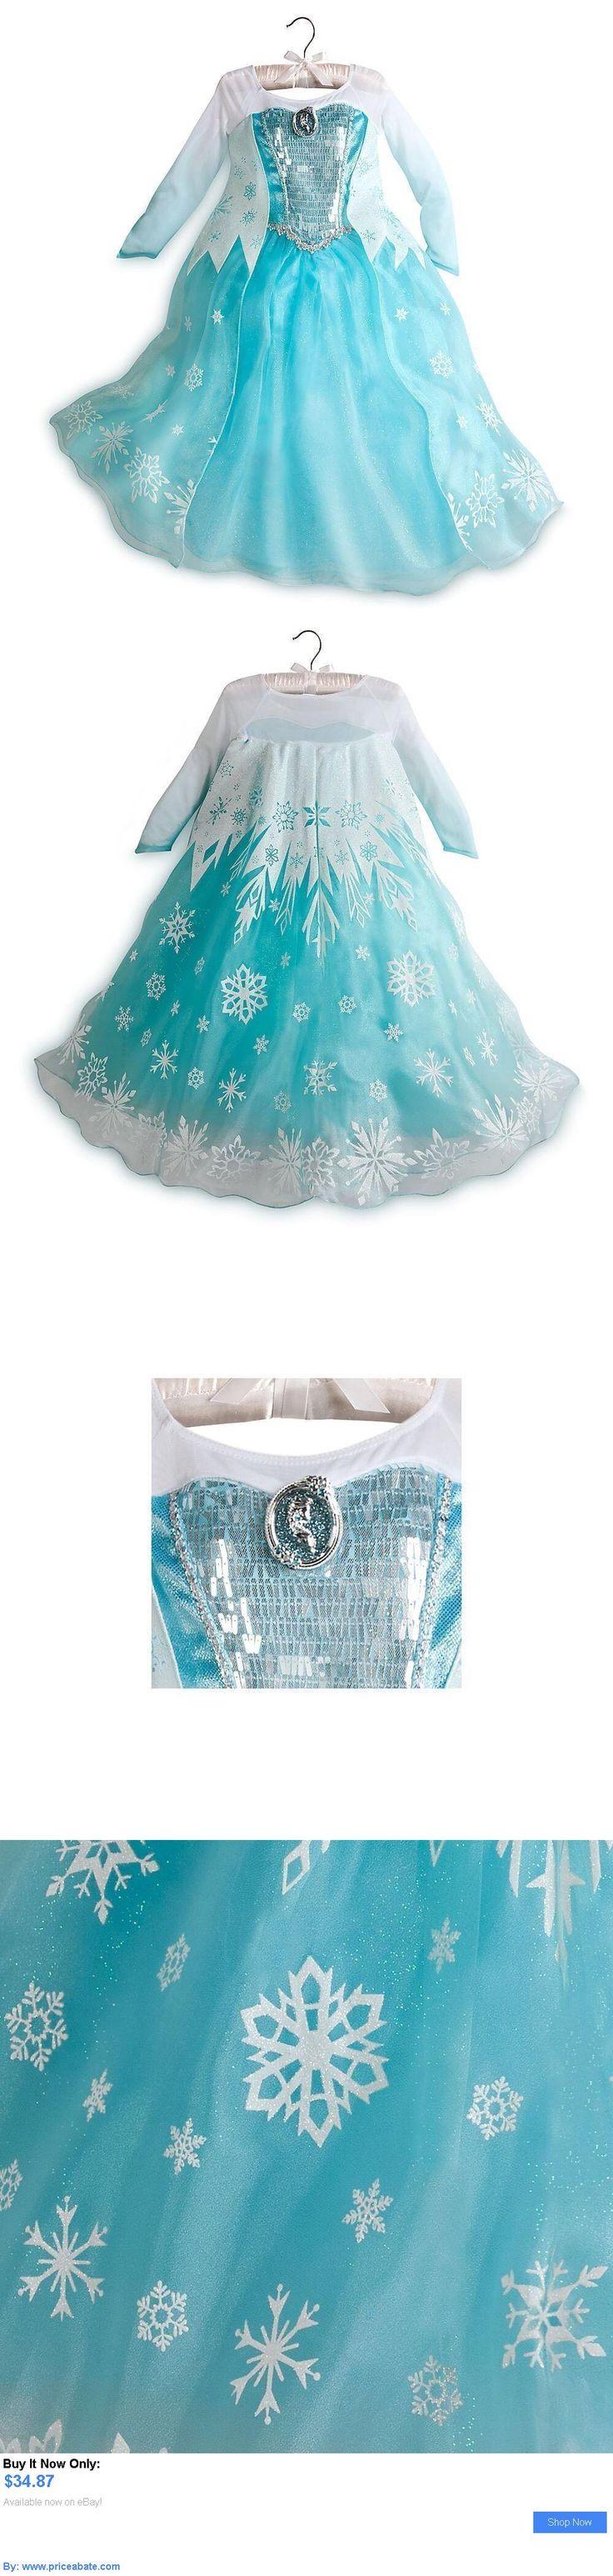 Kids Costumes: Nwt Disney Store Elsa Cameo Dress Costume Gown 7/8 9/10 Frozen Princess BUY IT NOW ONLY: $34.87 #priceabateKidsCostumes OR #priceabate